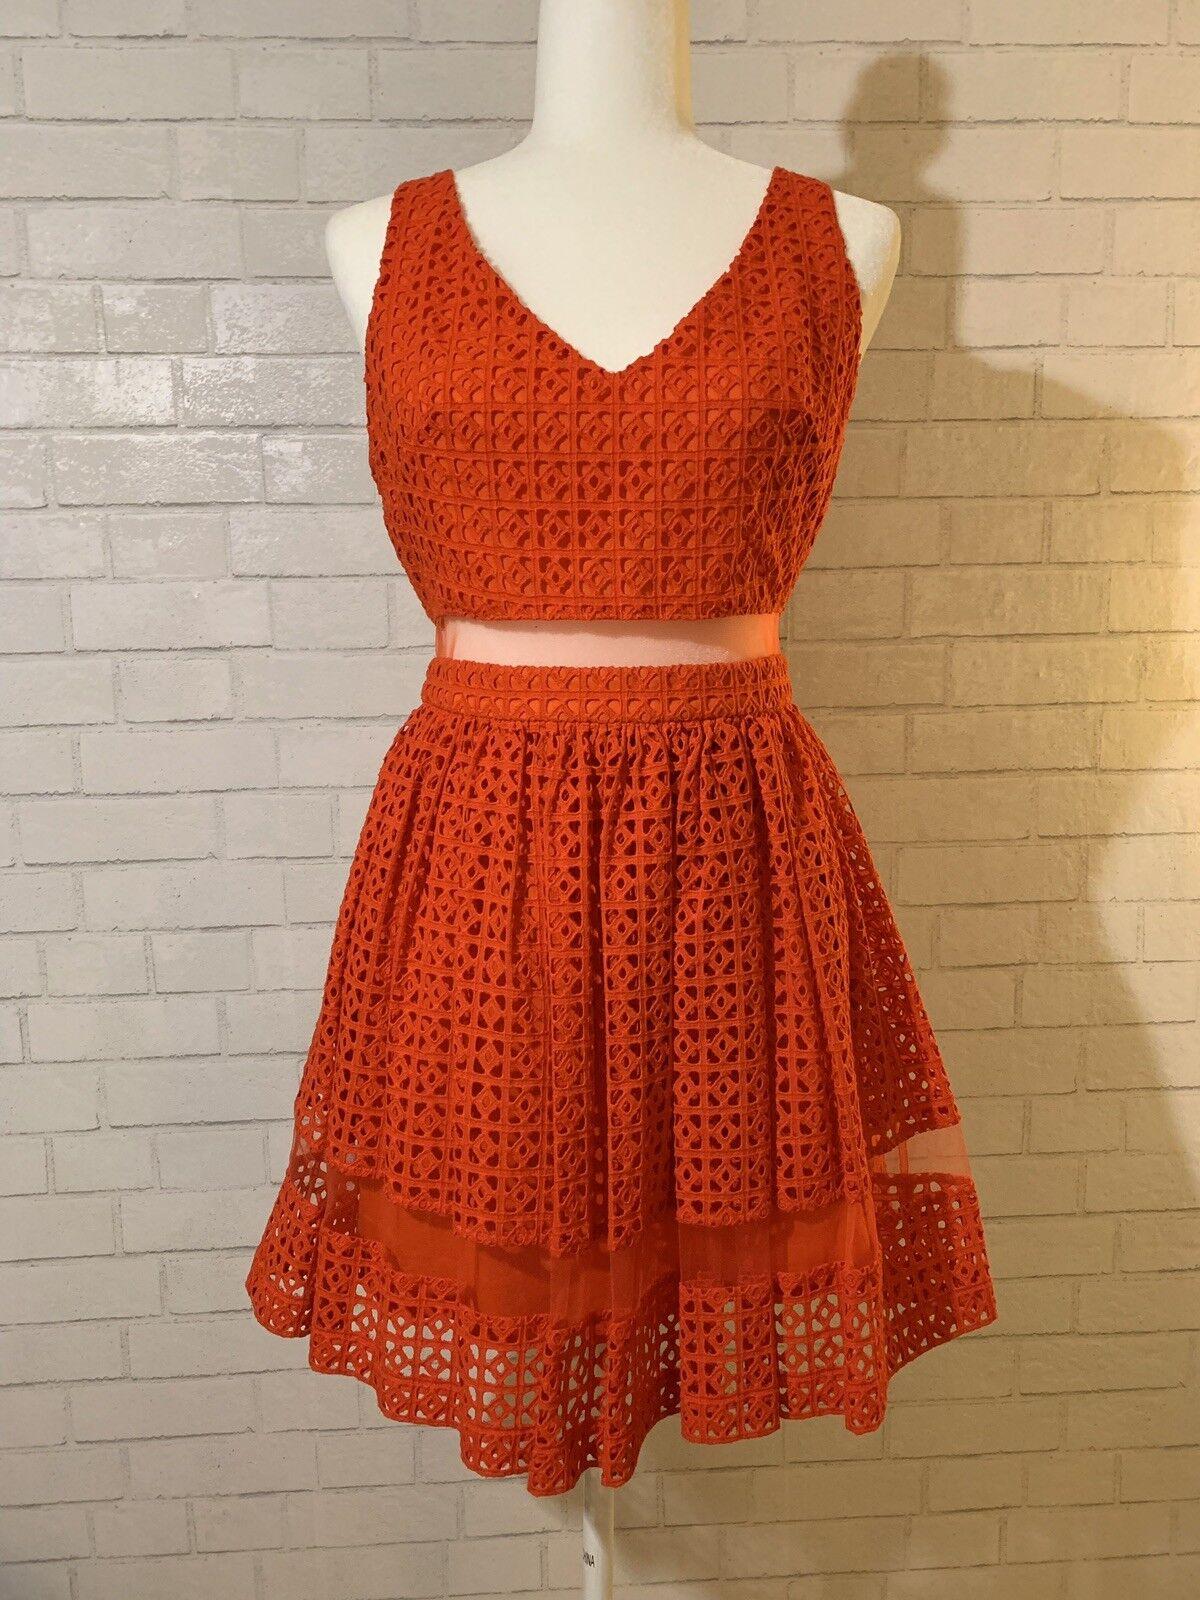 a4ecc0411a3e8 orange Flare Dress Bebe Red npyrbu1467-Dresses - www ...